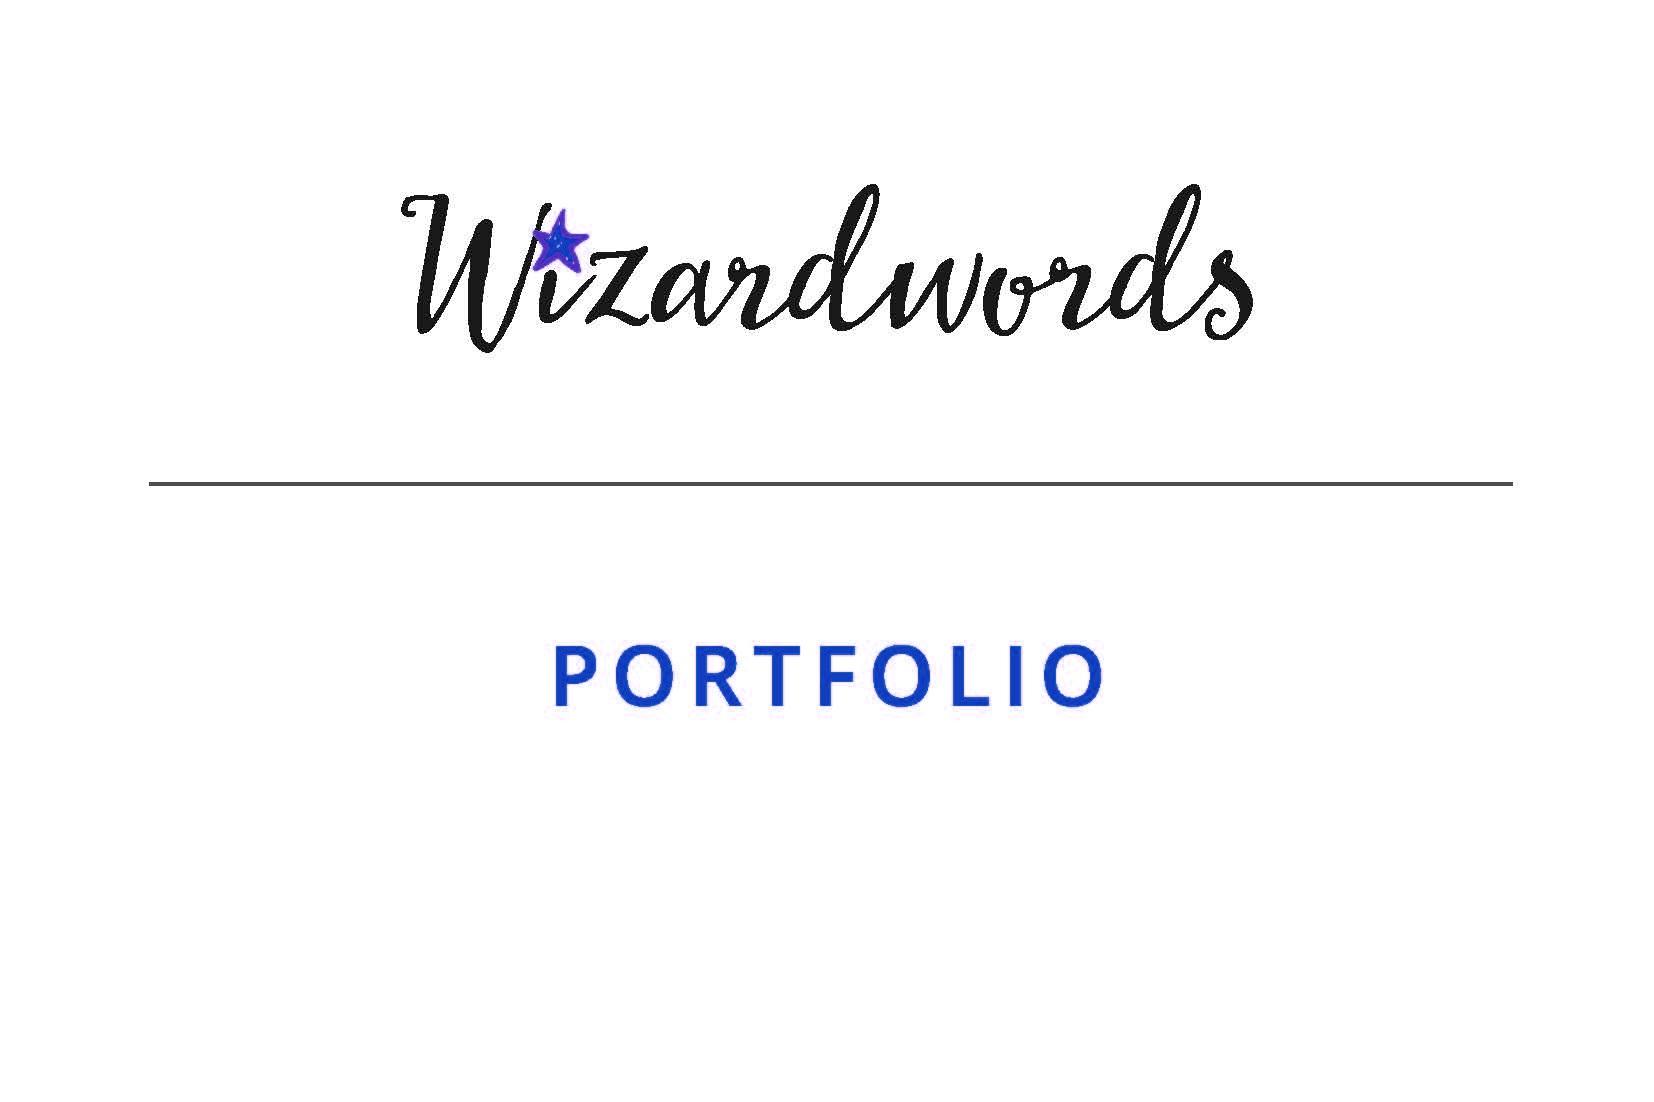 Denise Barrett Wizardwords Portfolio 2019 image_Page_01.jpg